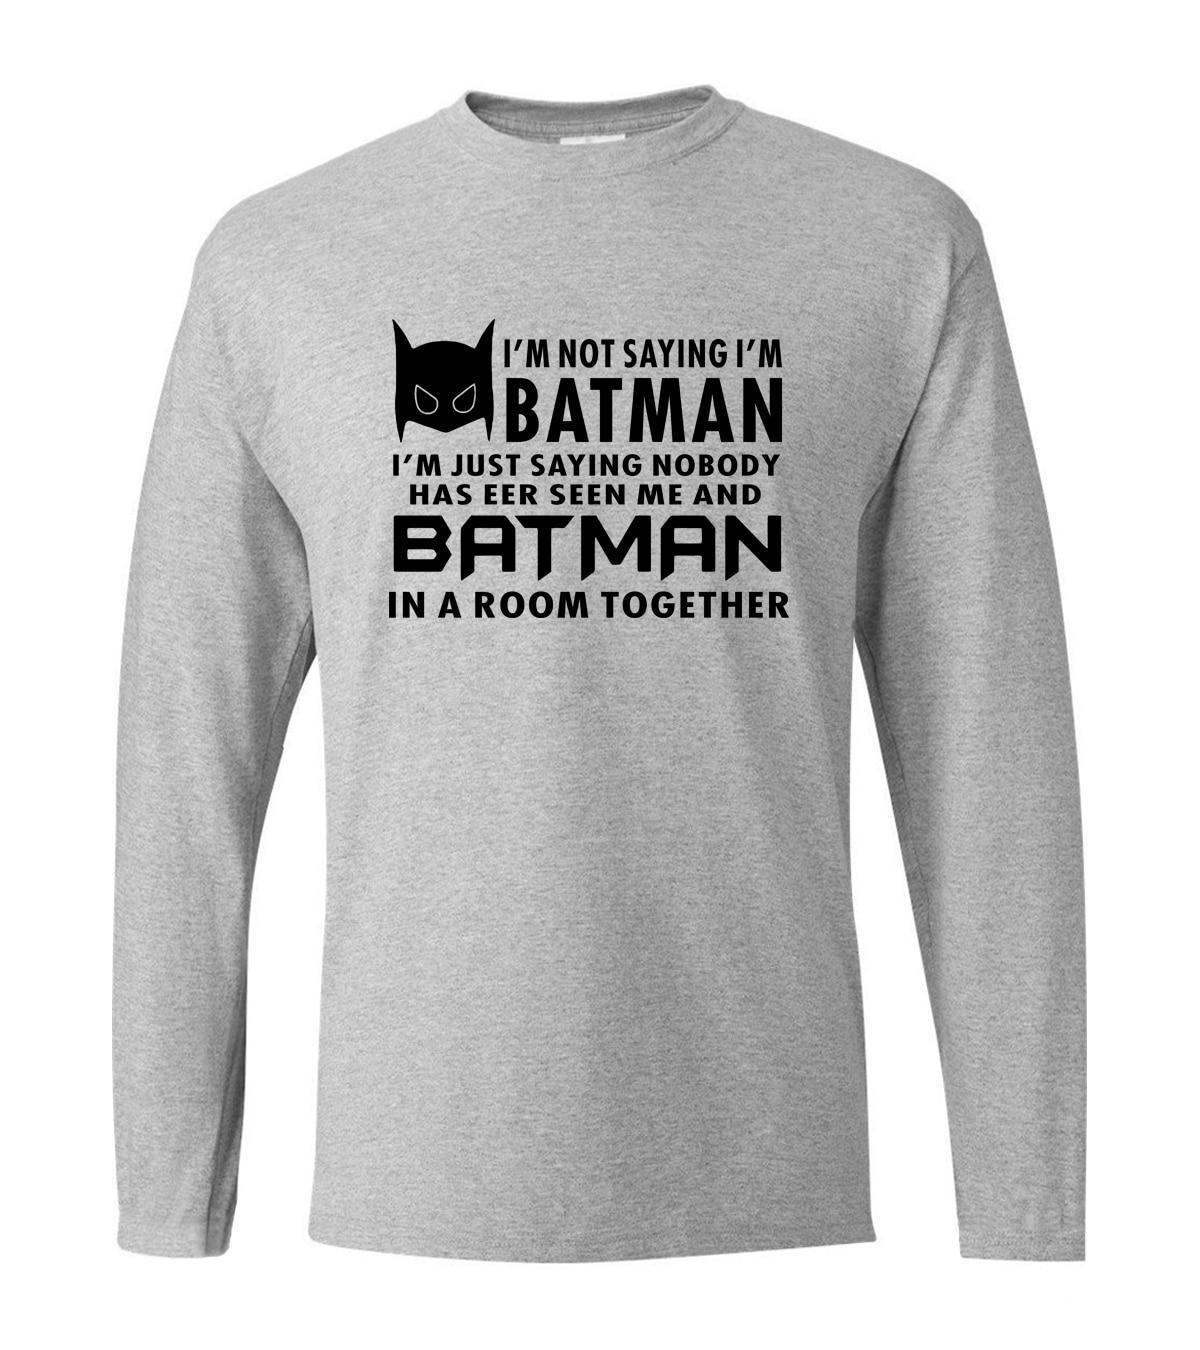 Adult t shirt I'm Not Saying I'm Batman men's long sleeve T-shirts 2019 new spring 100% cotton hip hop men  top tees for fans